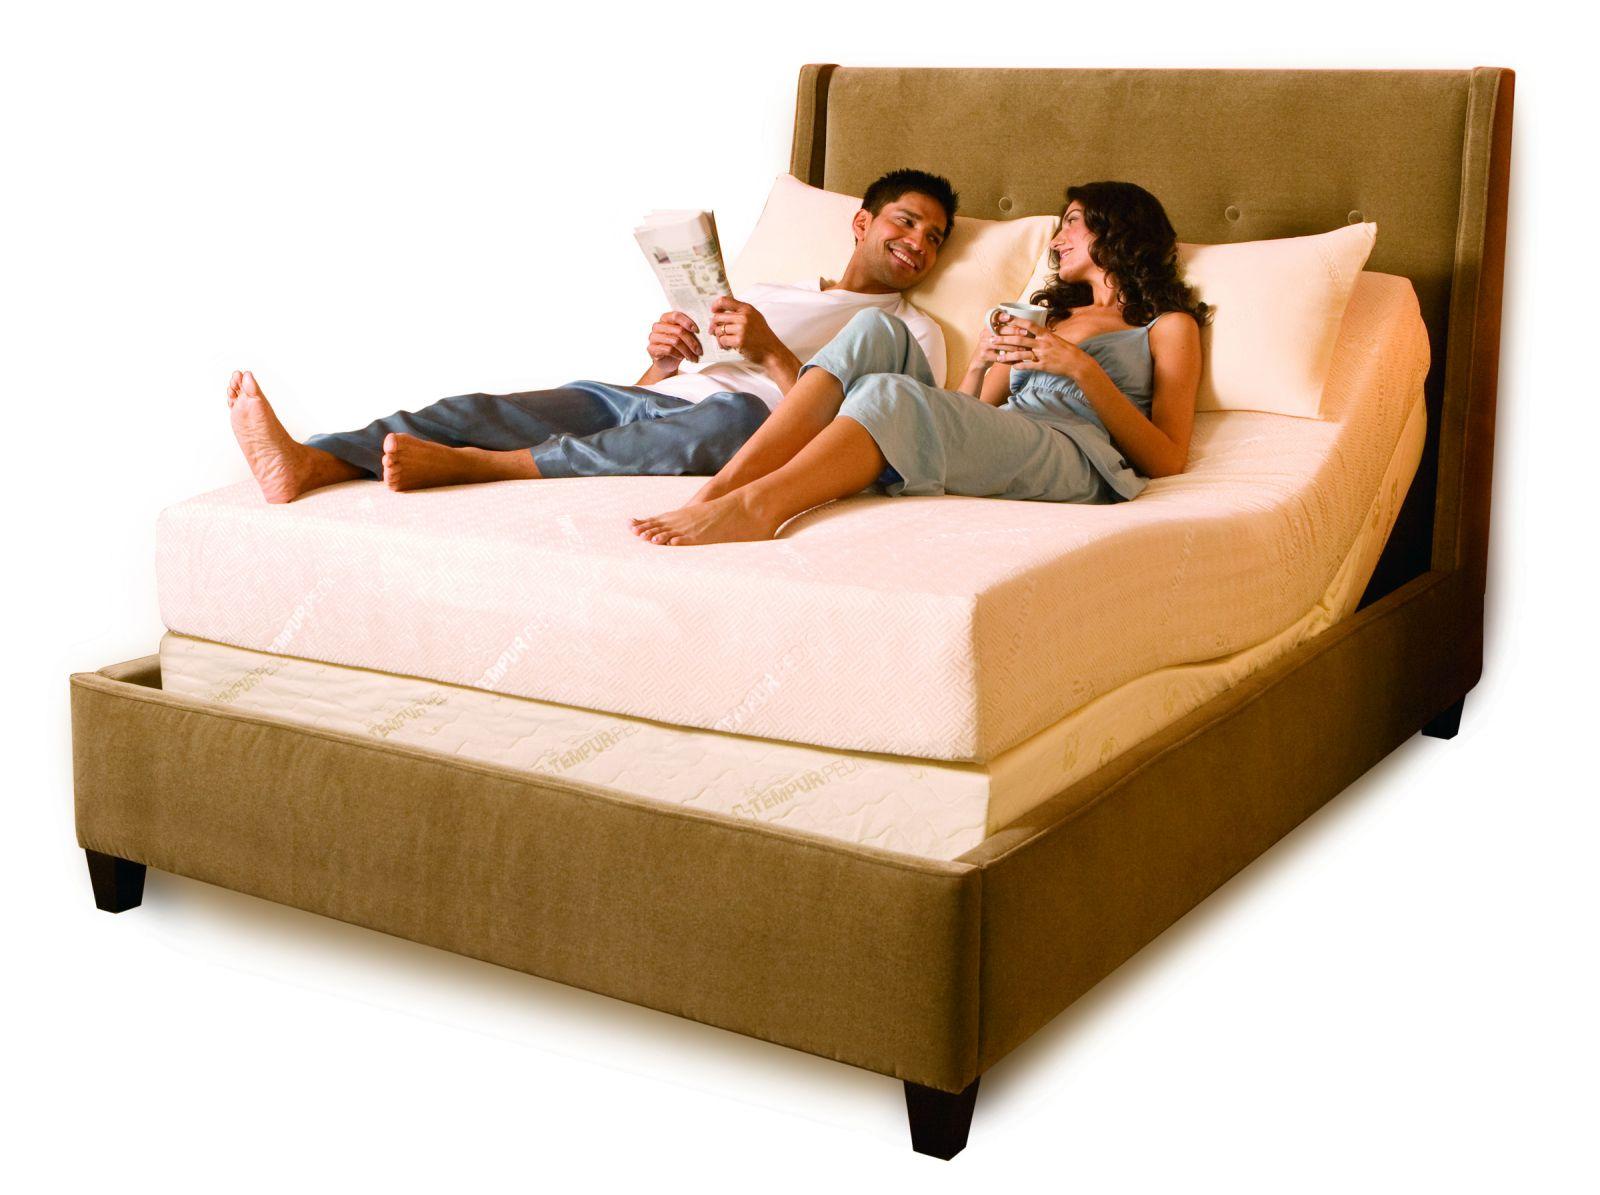 Beauty Adjustable Bed Frame (Image 2 of 10)